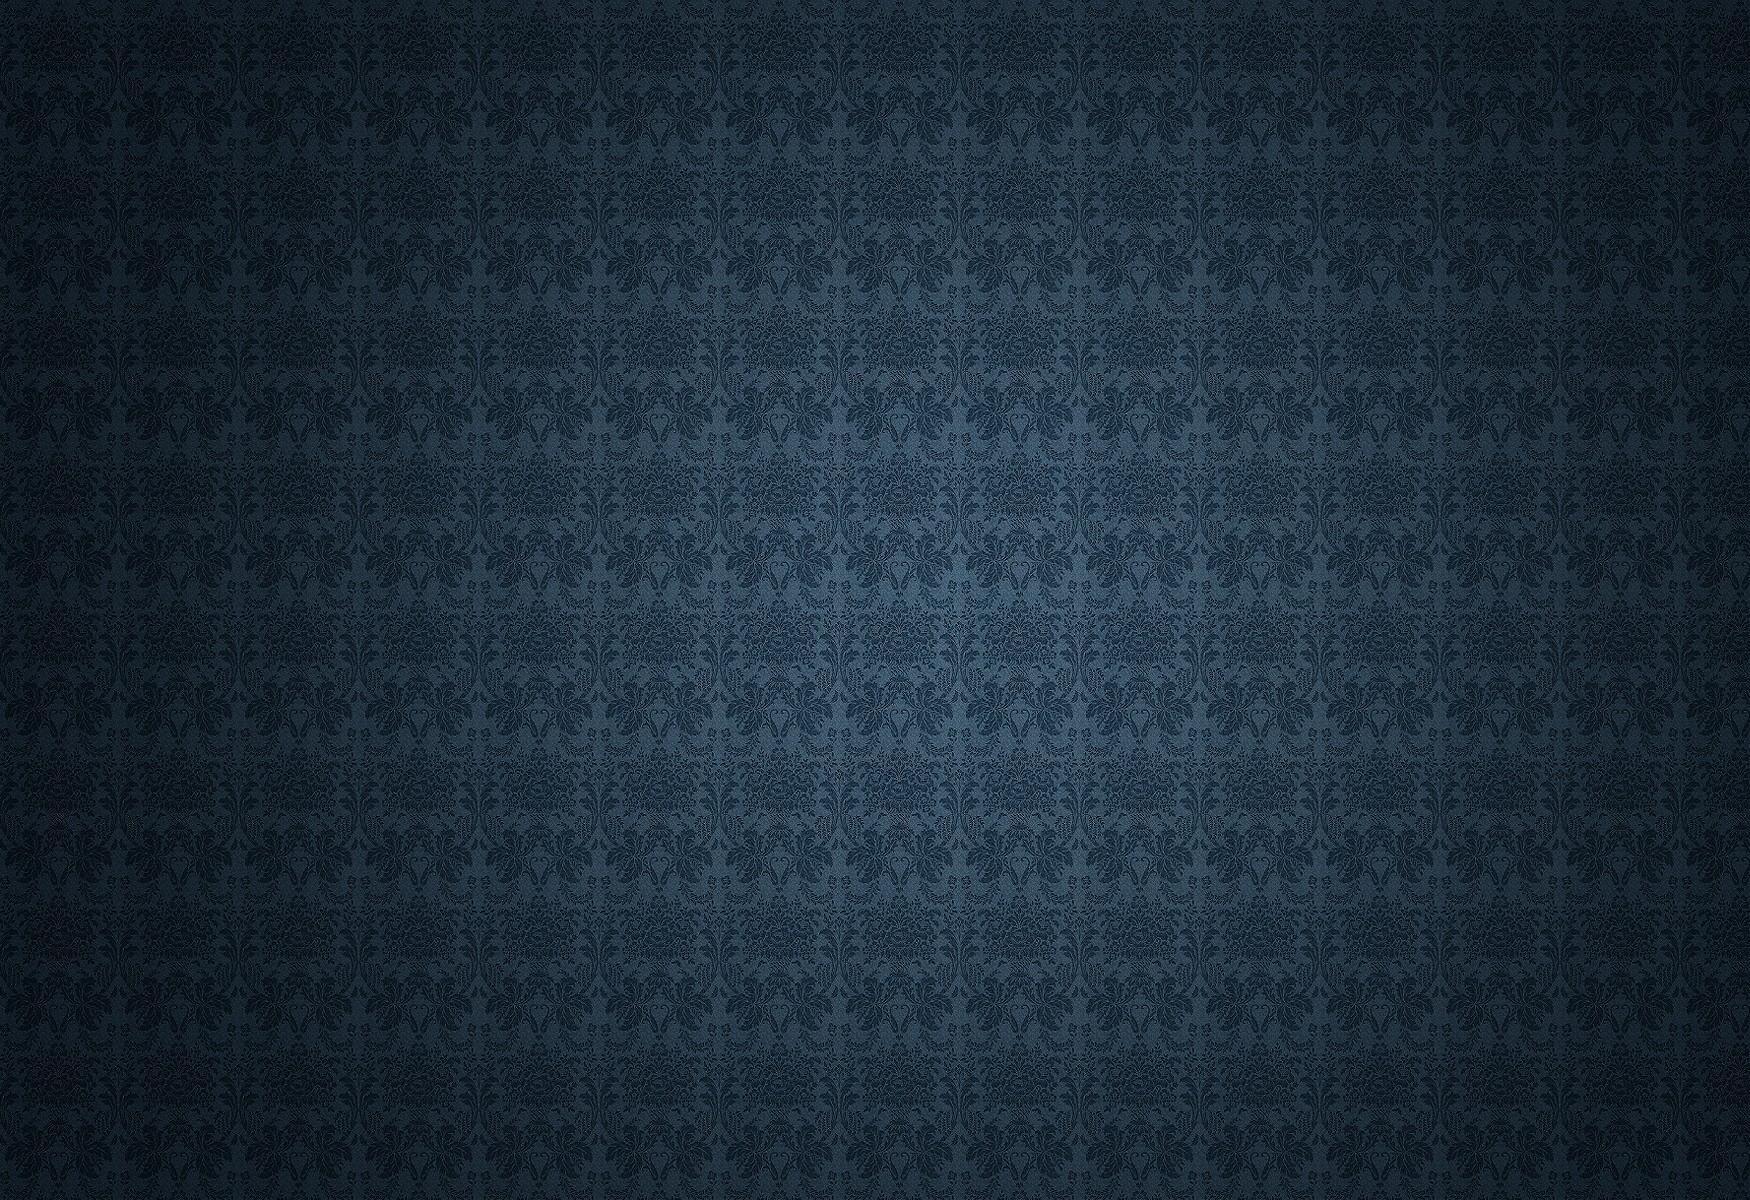 Pattern-wallpaper-11.jpg - hipster hub